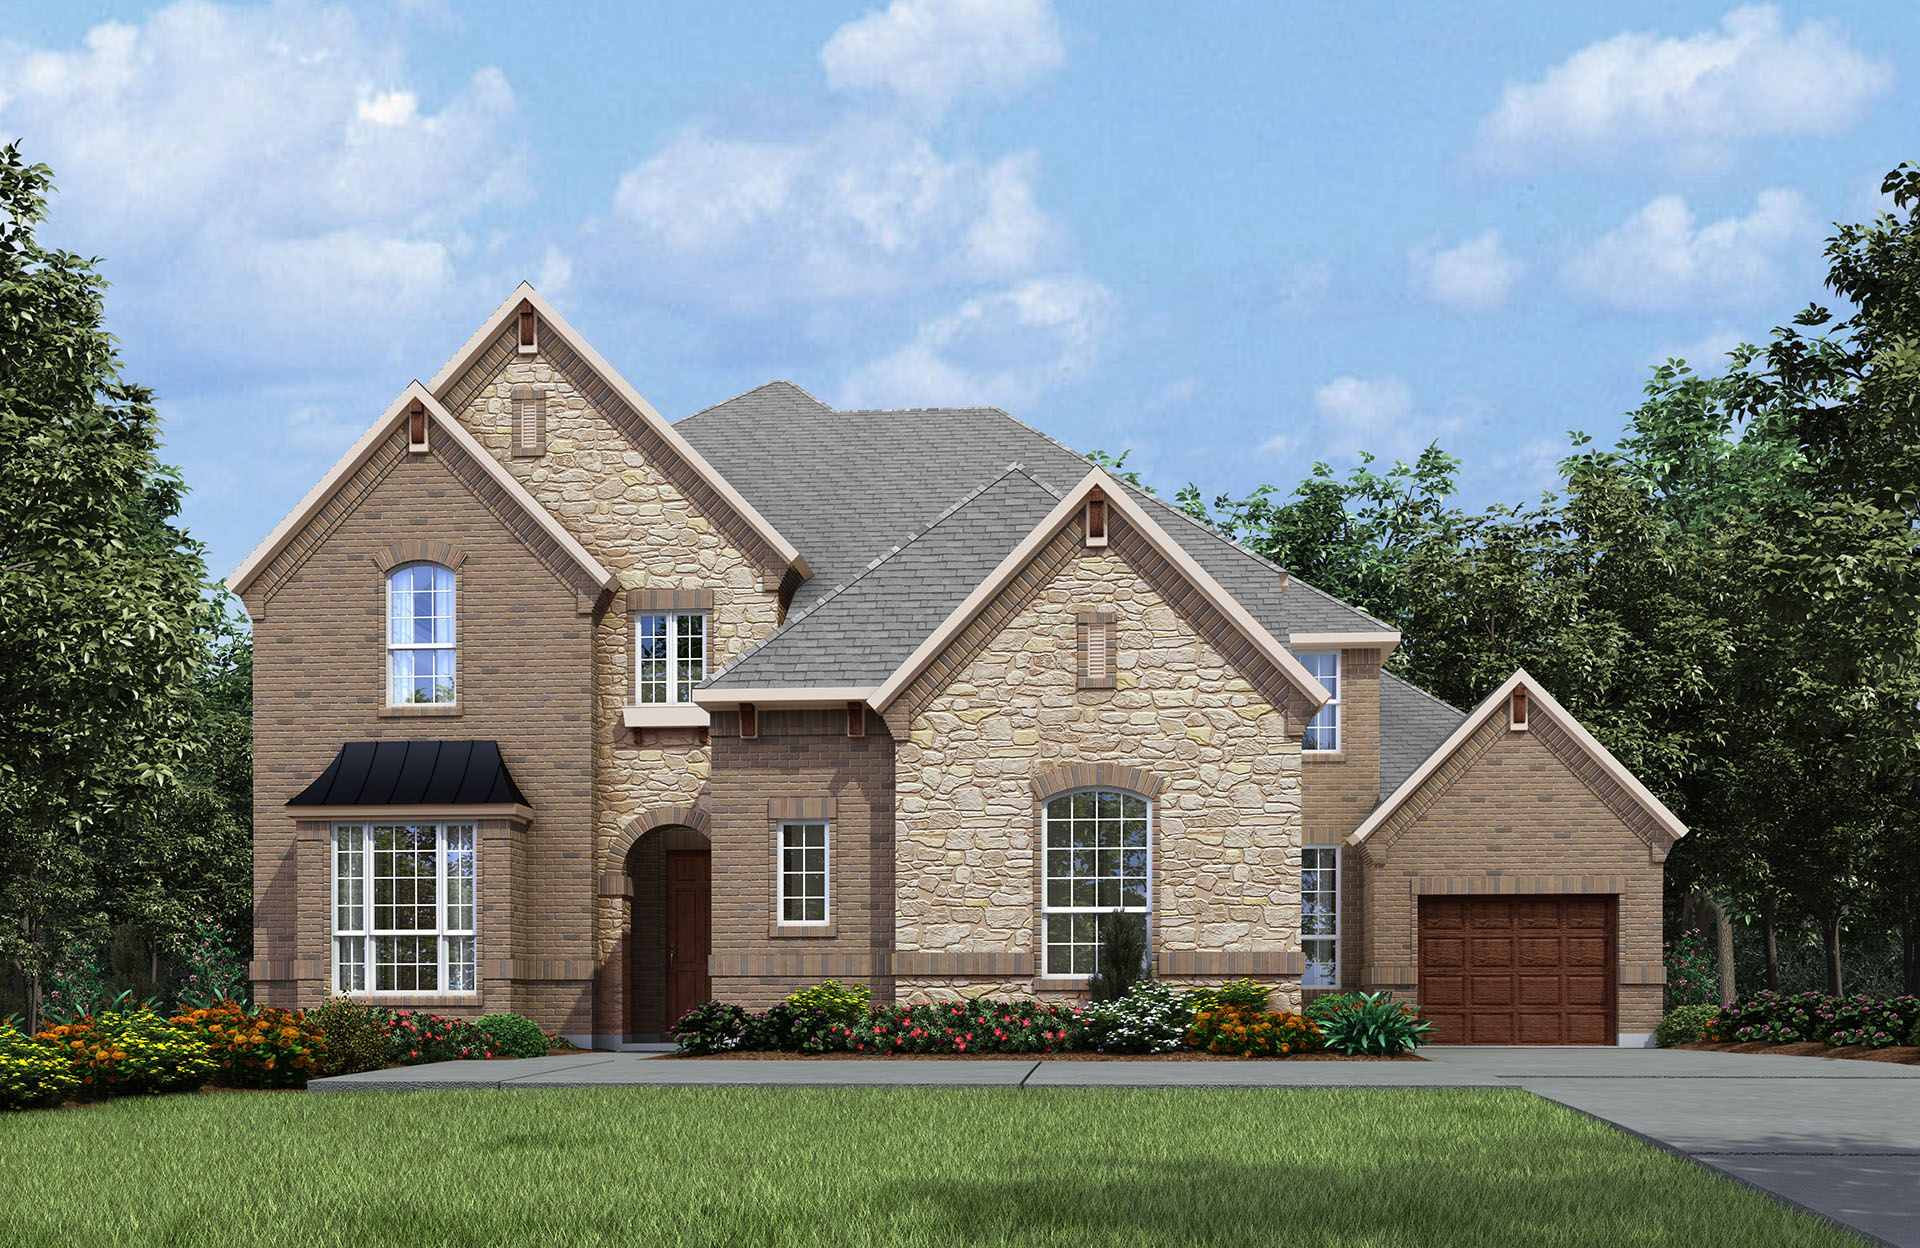 Single Family for Active at Viridian - Oakley Ii 1344 Viridian Park Lane Arlington, Texas 76005 United States